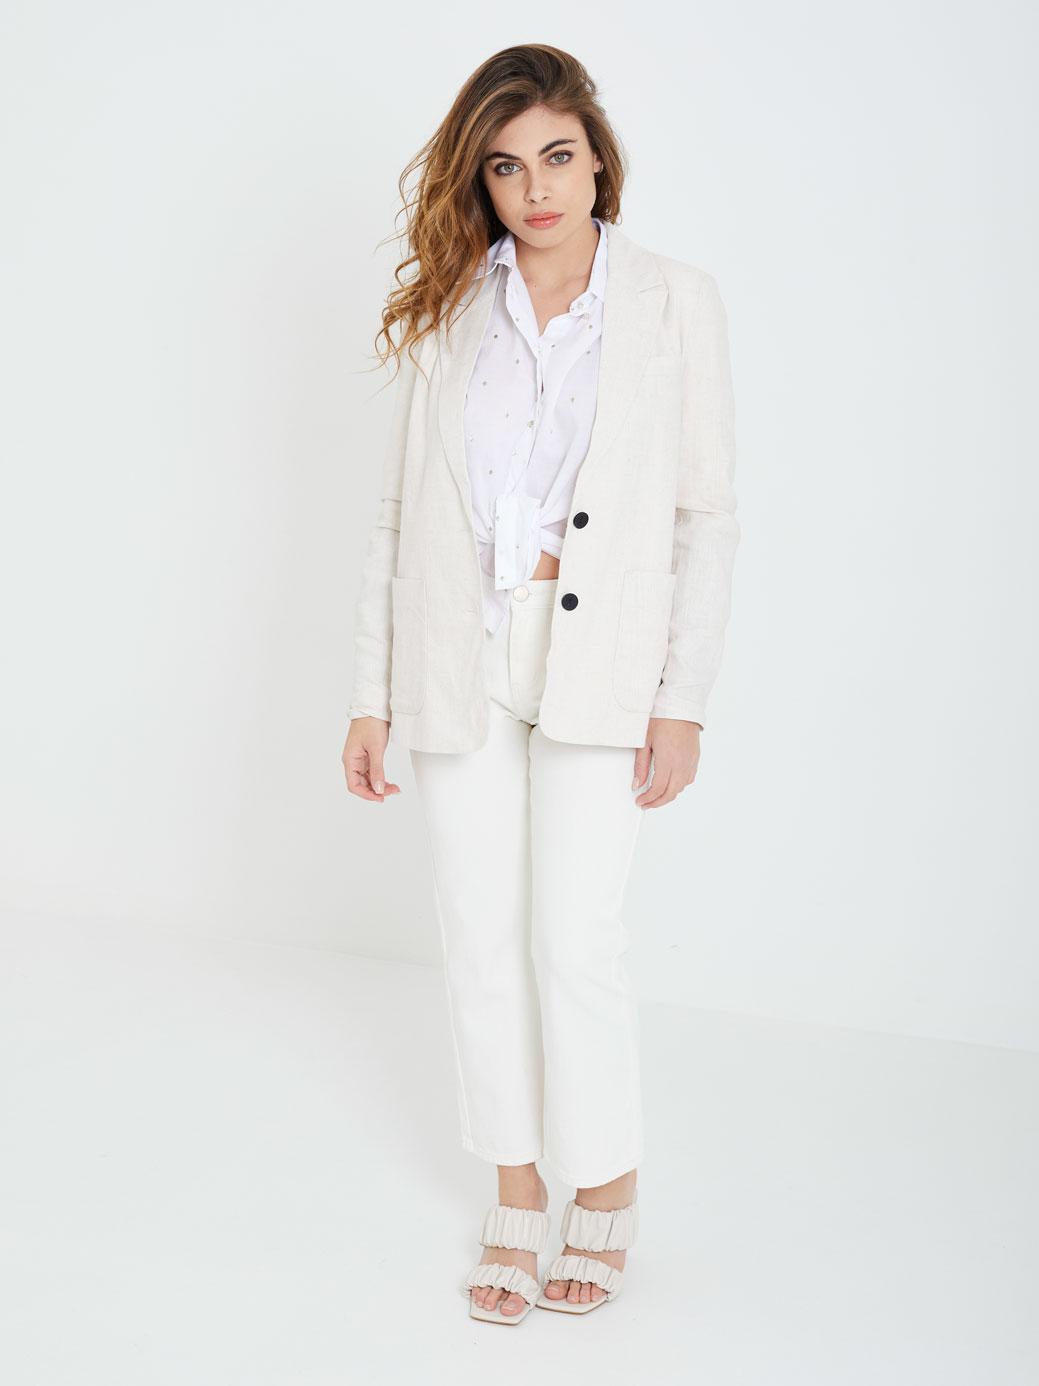 Jacket VERO MODA | Jackets | 10243692BEIGE